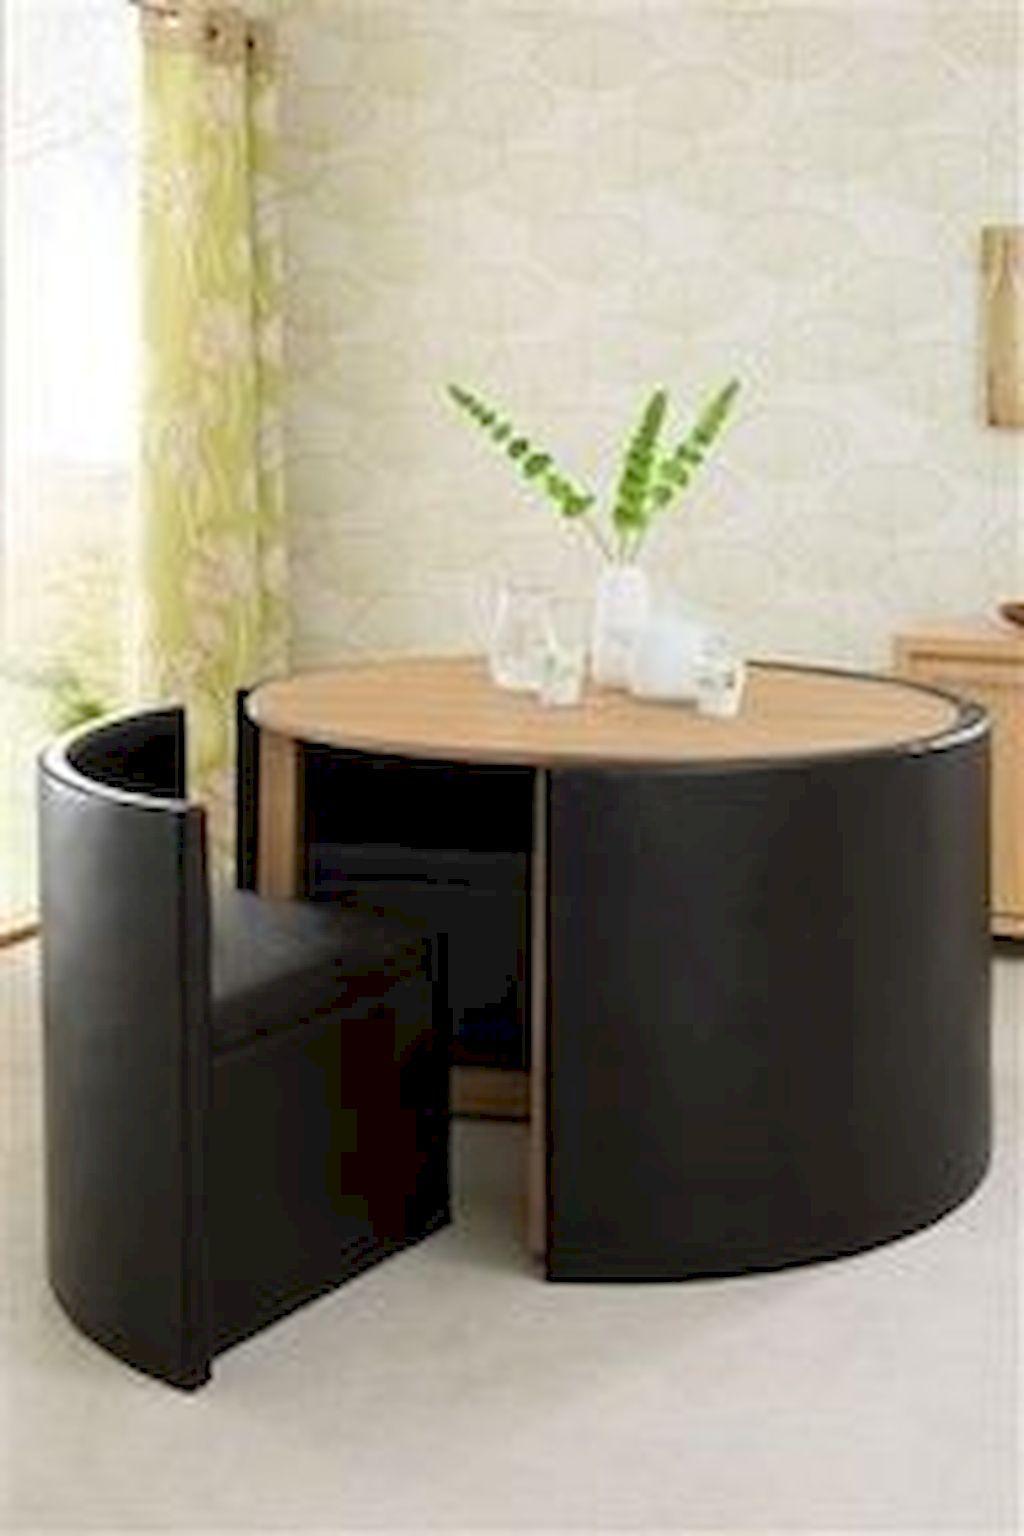 Stunning Space Saving Dining Table Space Saving Furniture Space